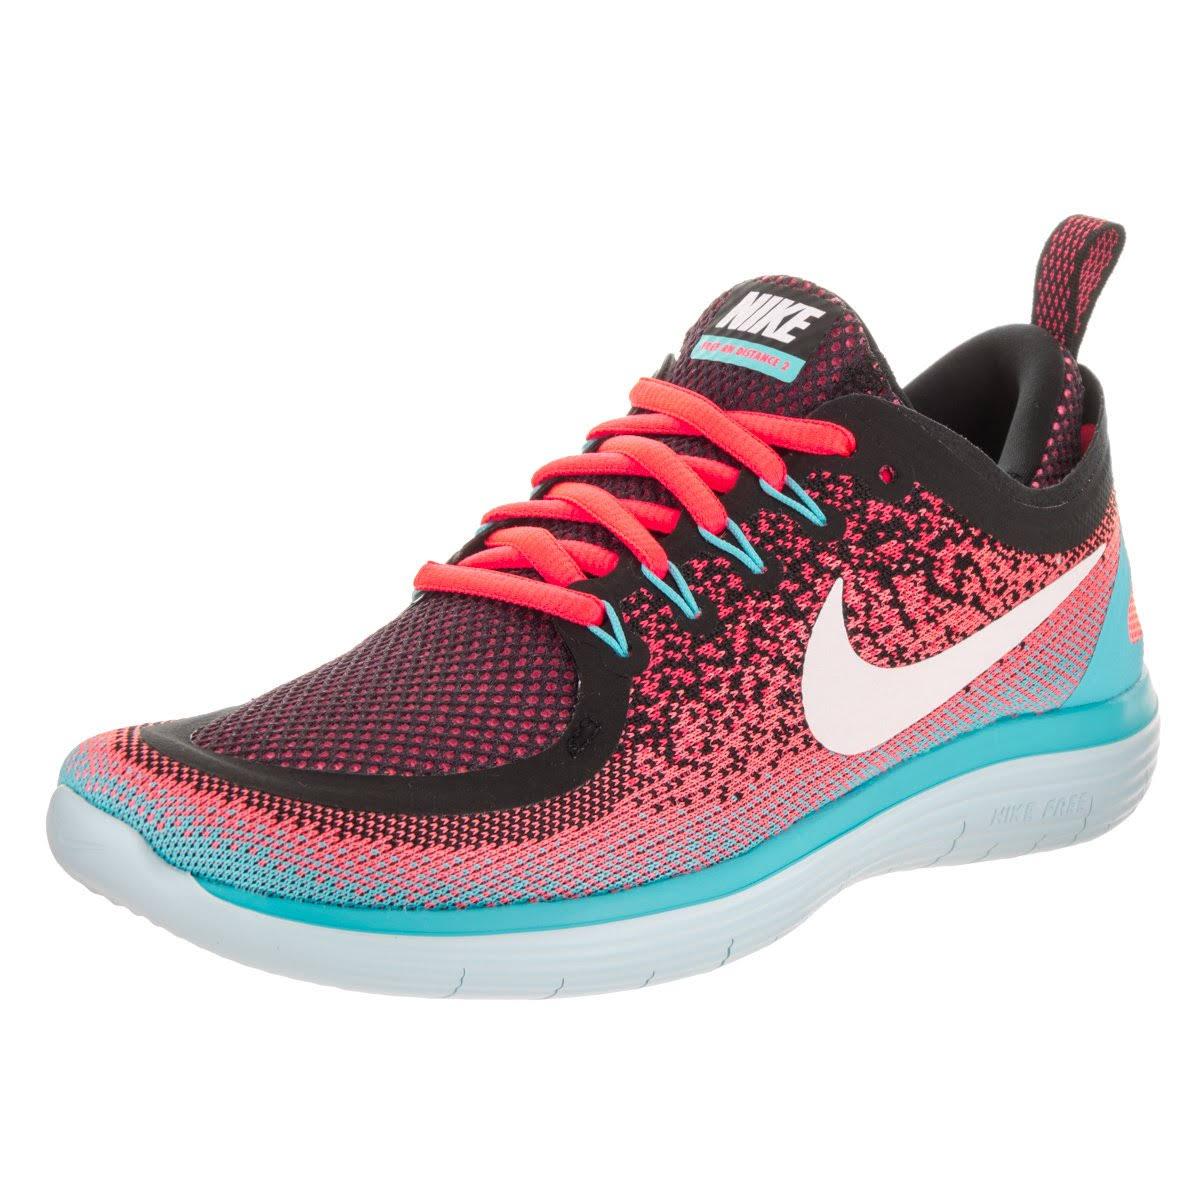 2 Punch Distance Rn Nike Heißer Von Kelly's Warehouse B Free 6 Damen nxYqHWUIq